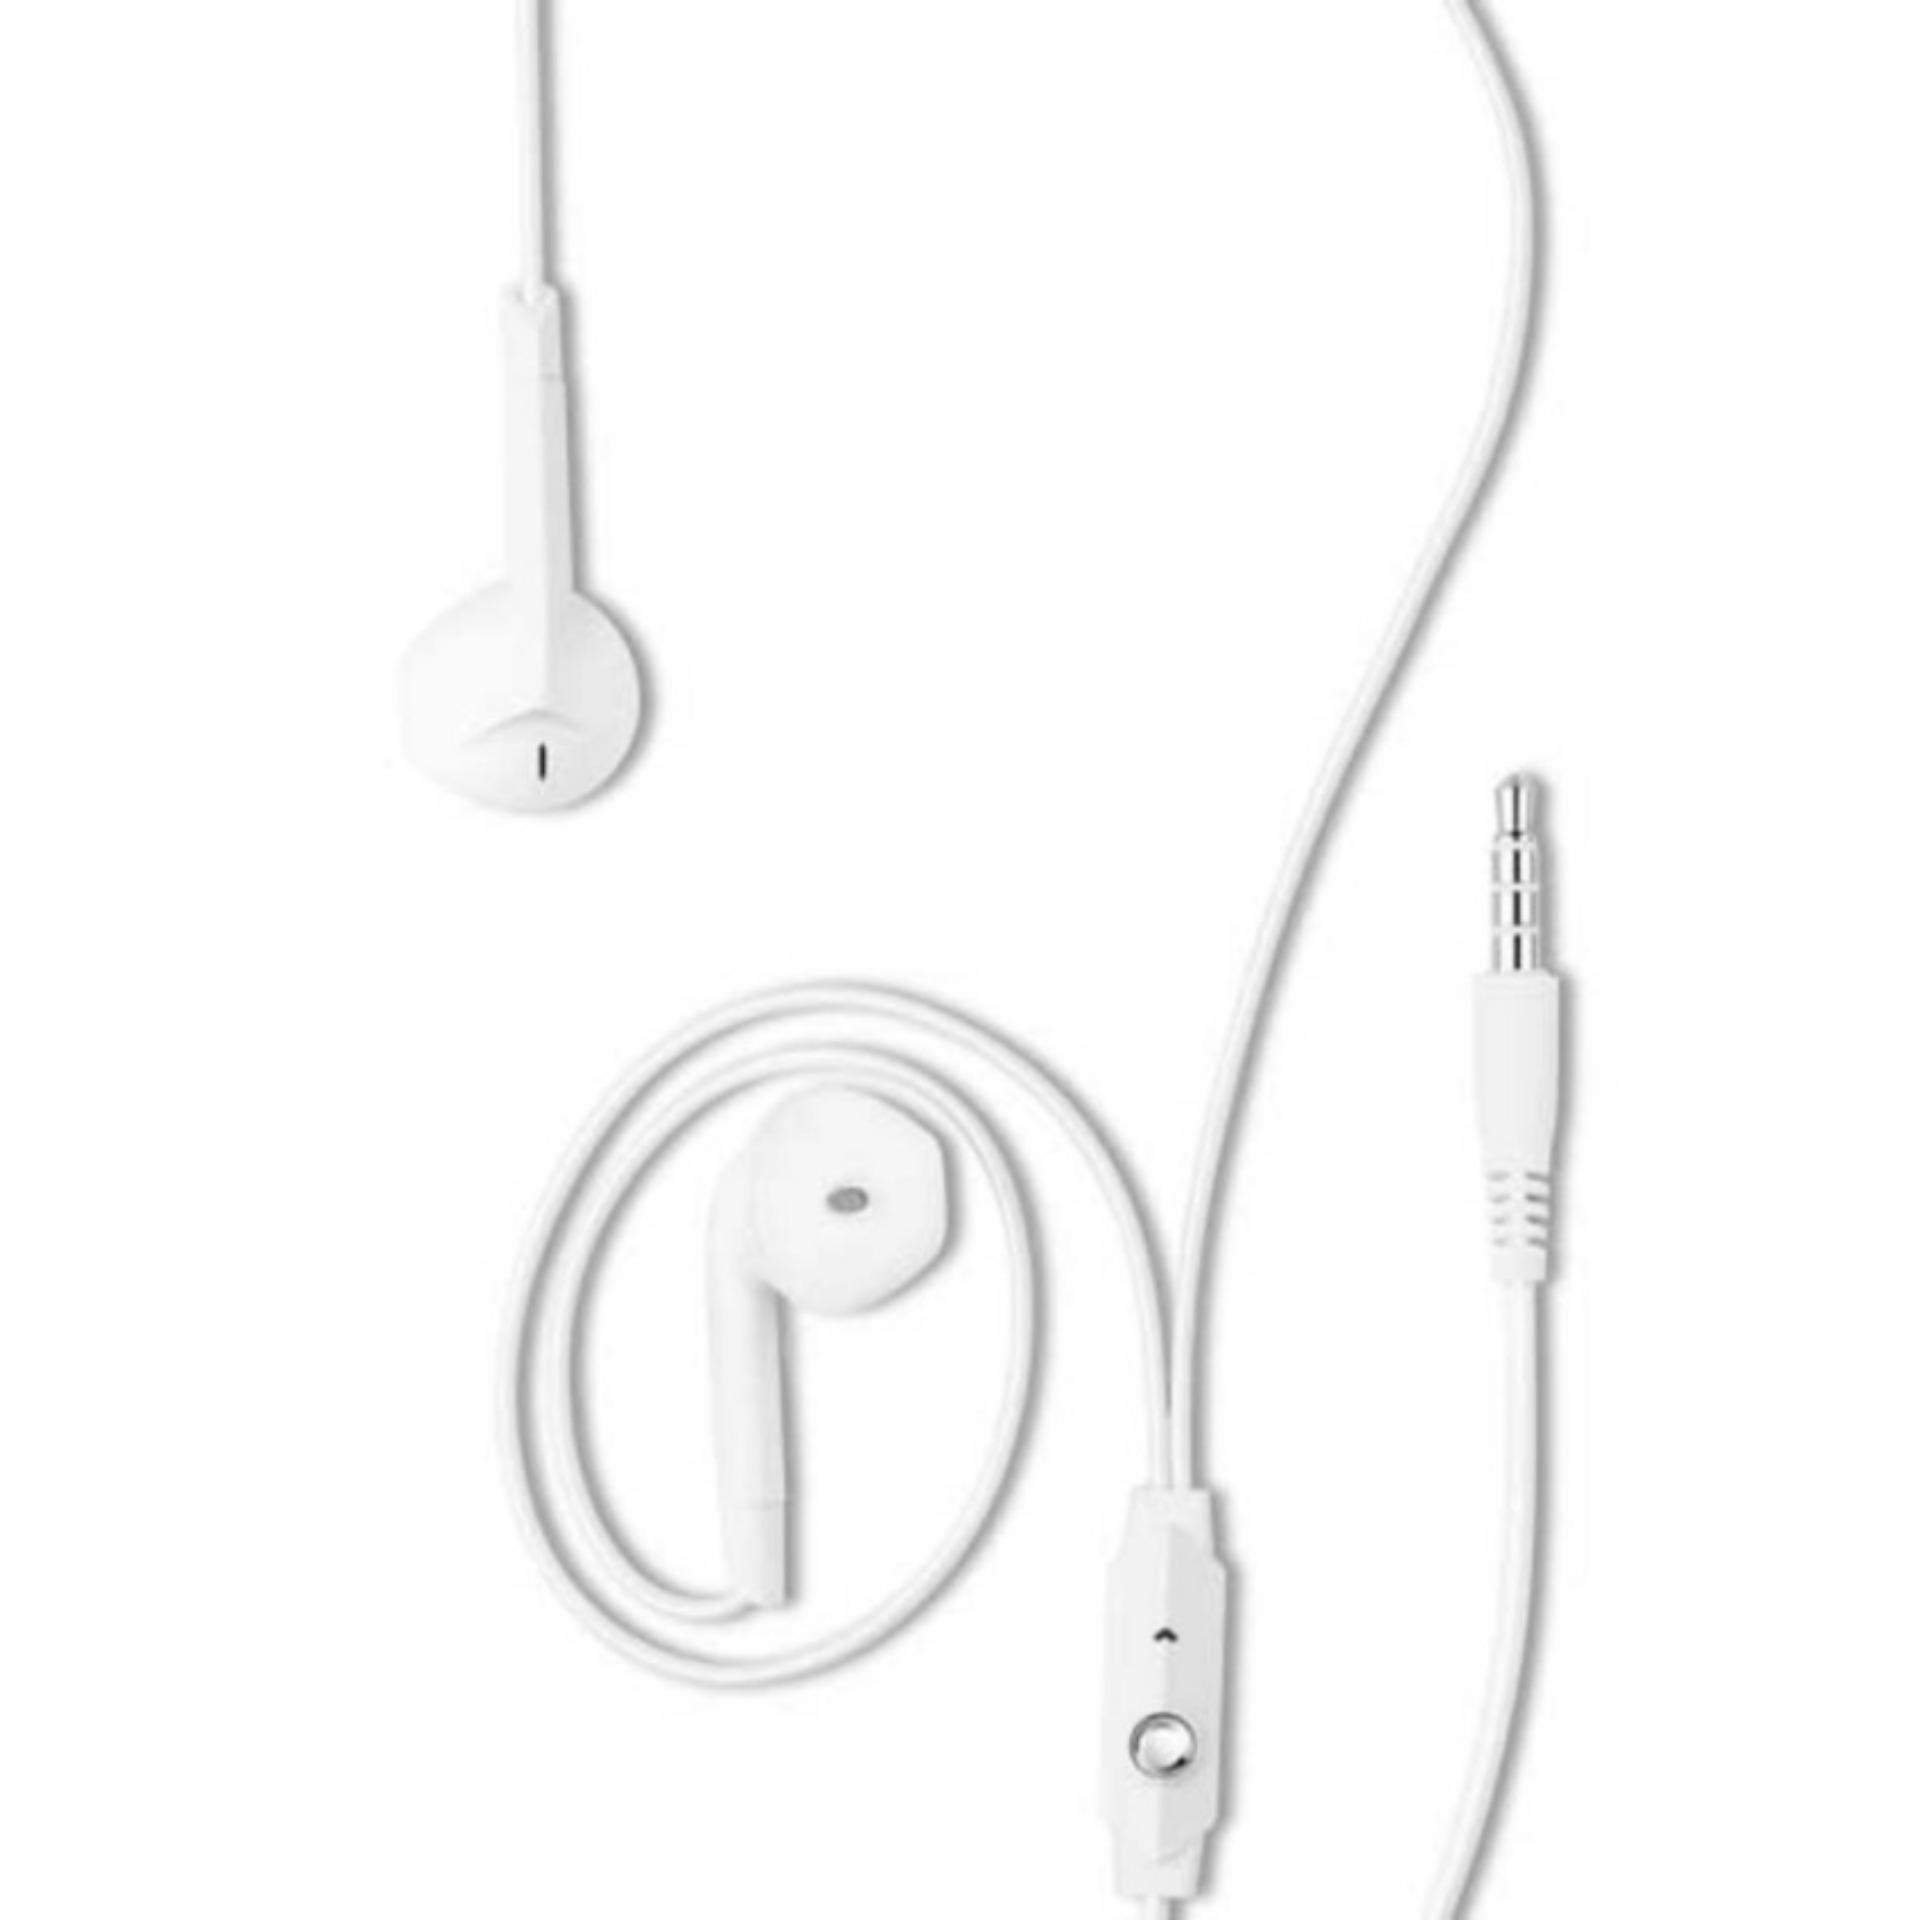 Hippo Hip Handsfree Stereo Bass Putih Cek Harga Terkini Dan Defunc Go Hybrid Corded Earphone Hf 012 Super